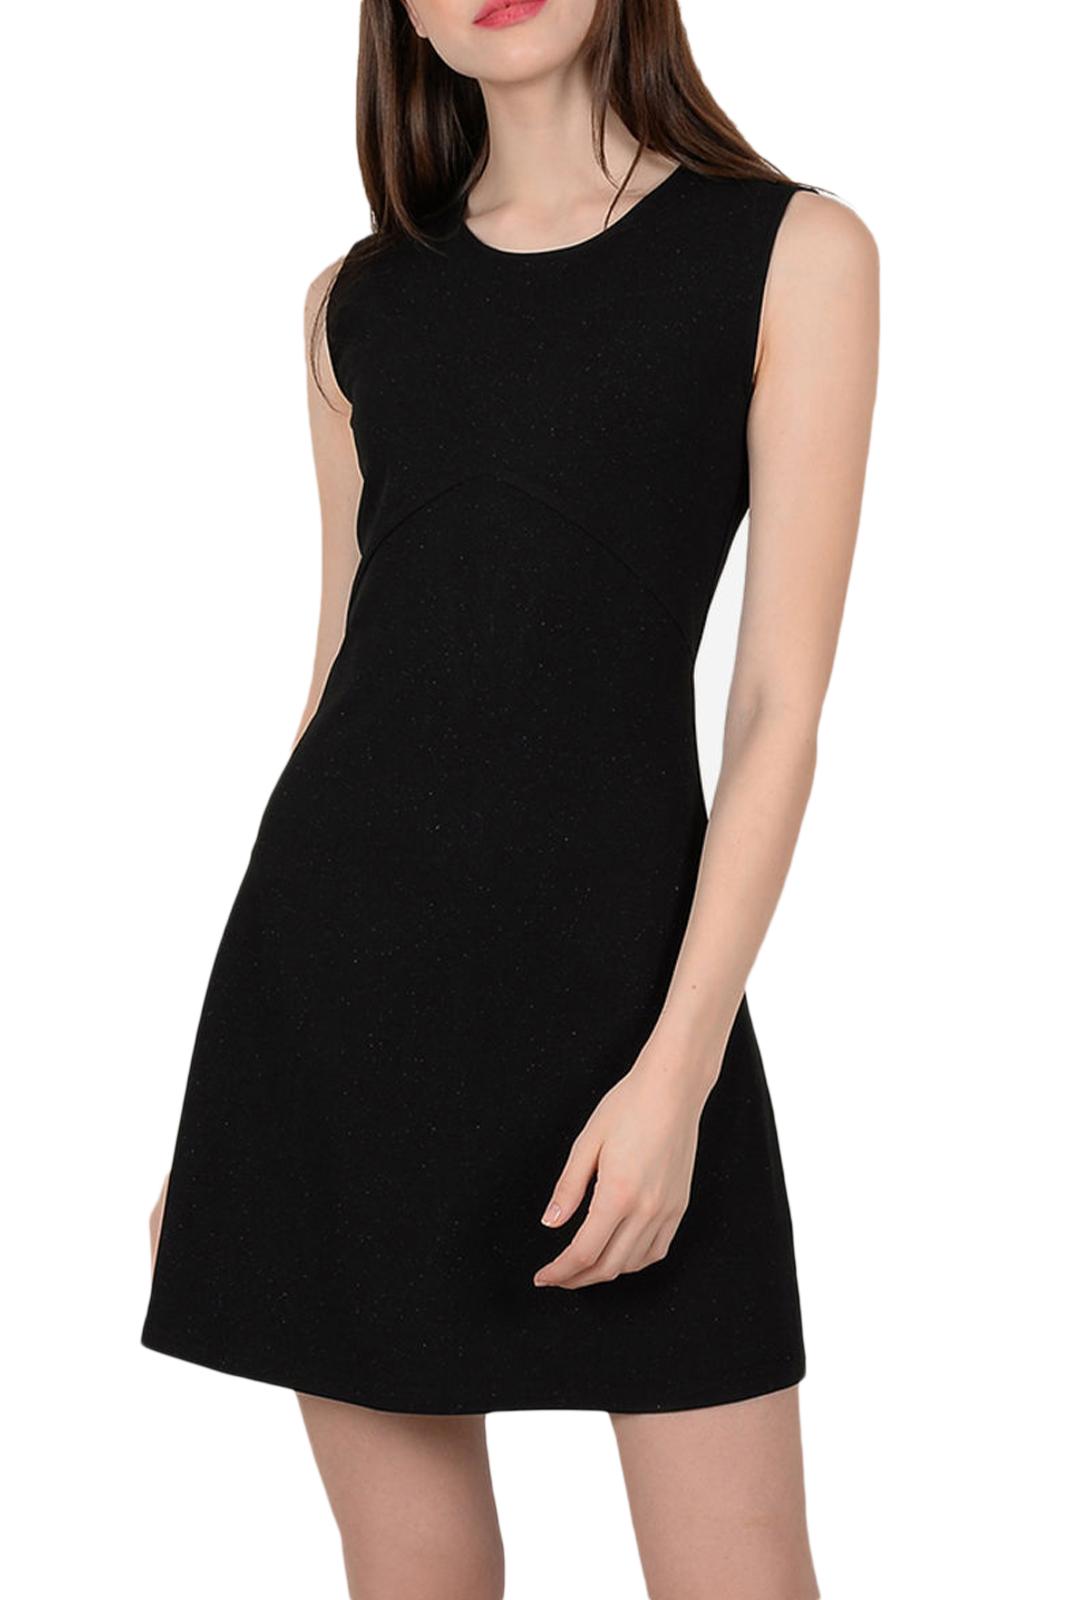 Robes  Molly bracken T641H19 BLACK